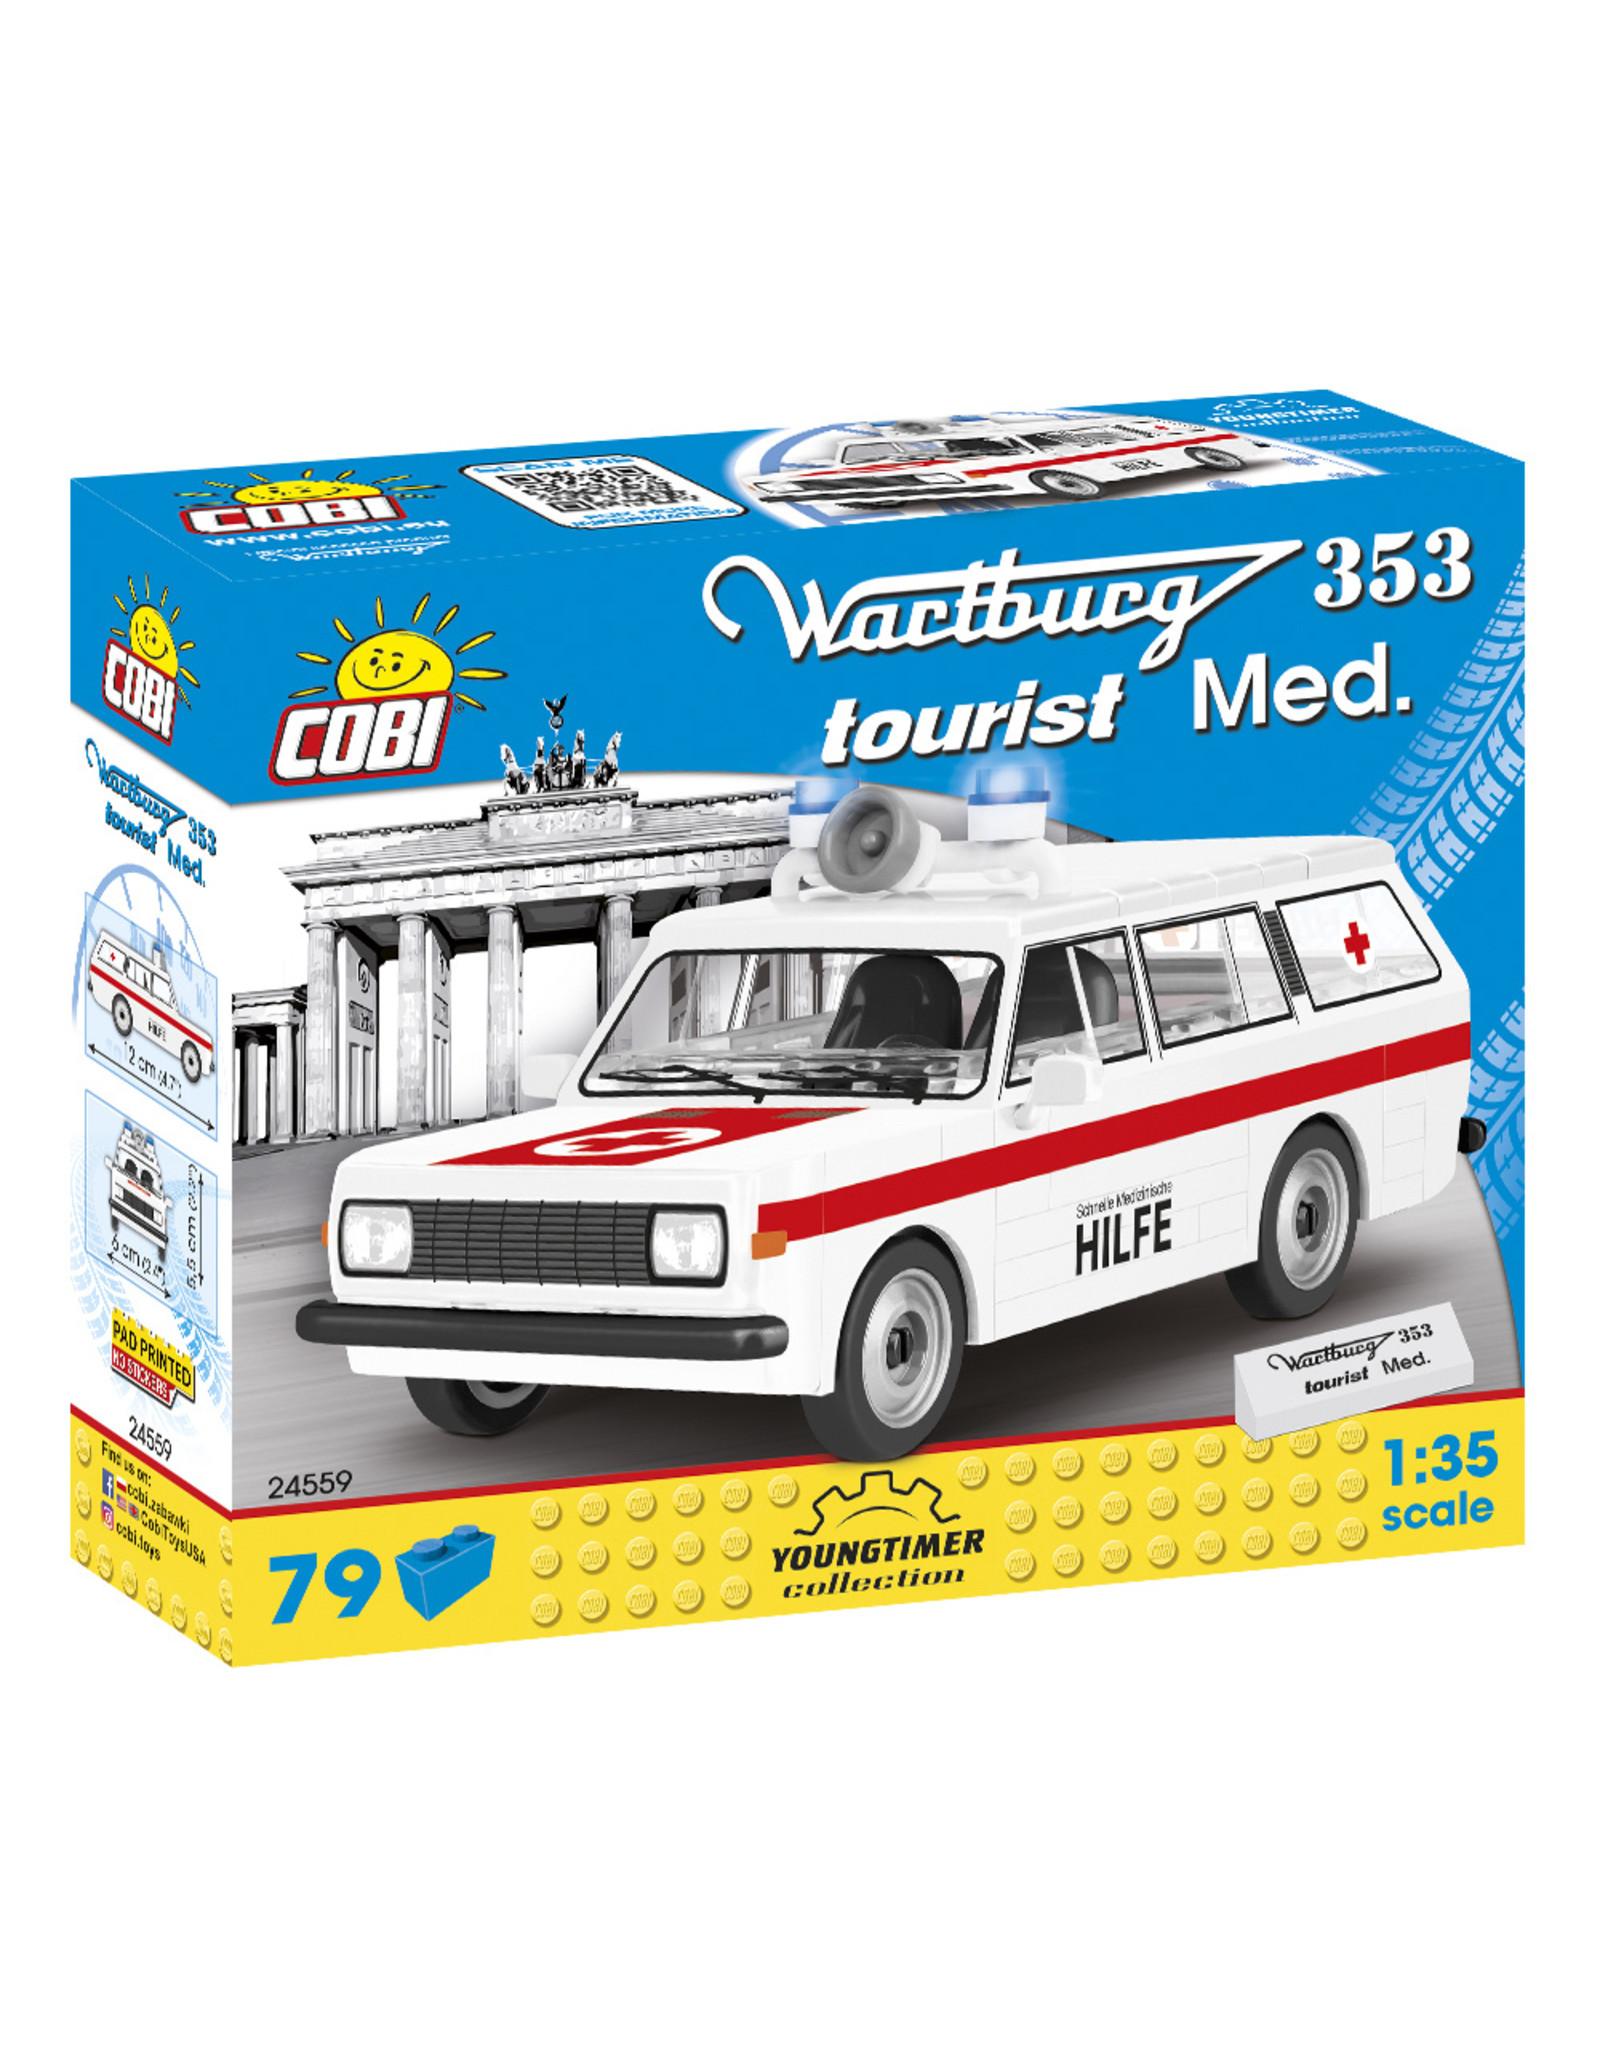 COBI COBI 24559 - Wartburg 353 Toerist Medical